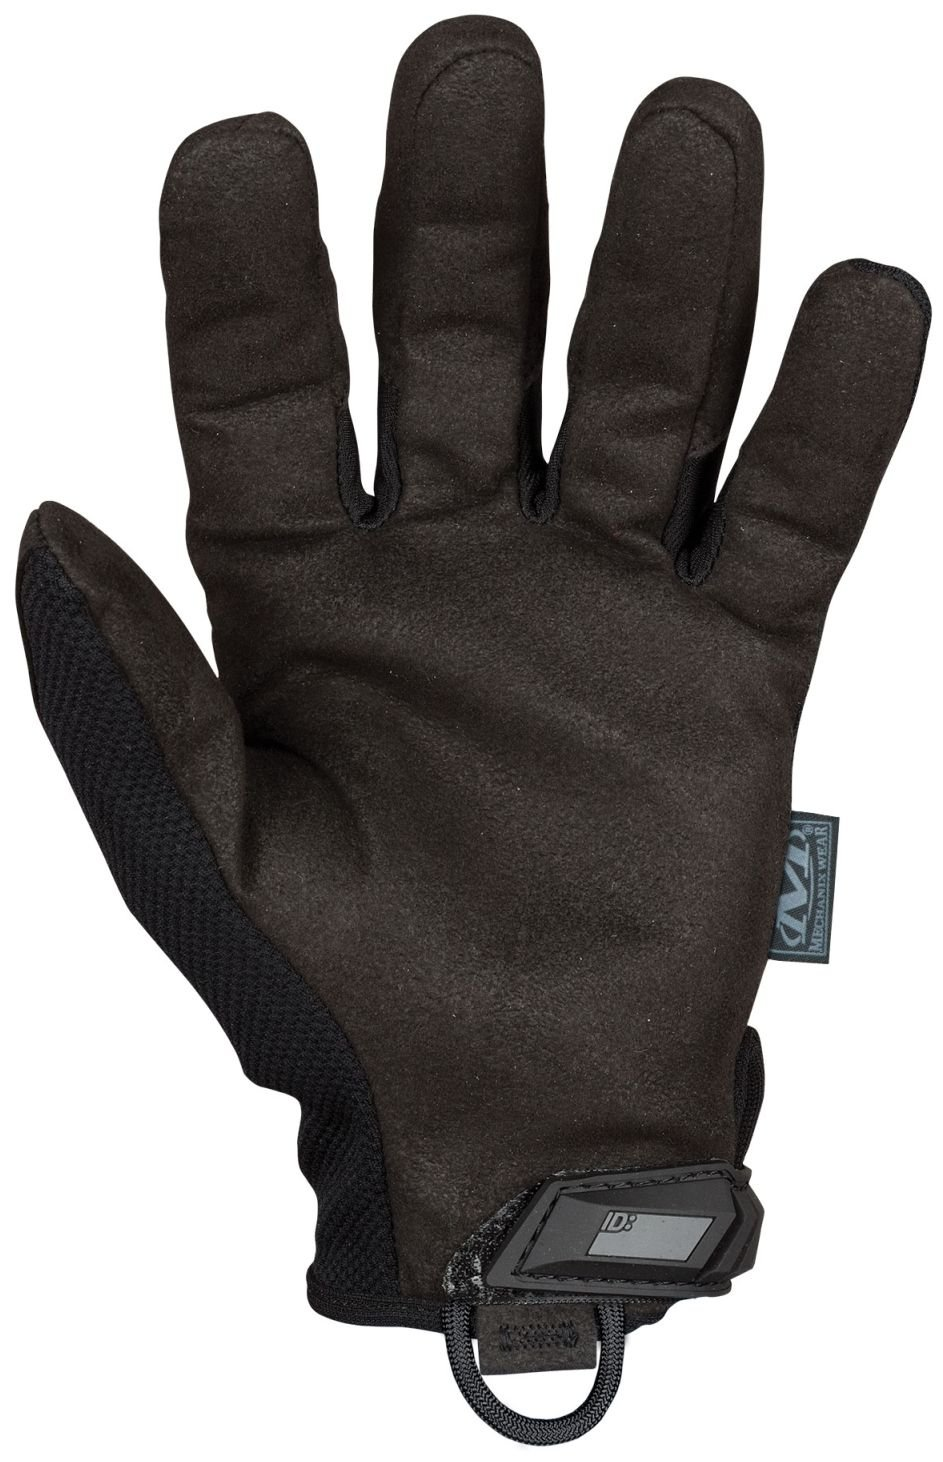 Best Shooting Gloves